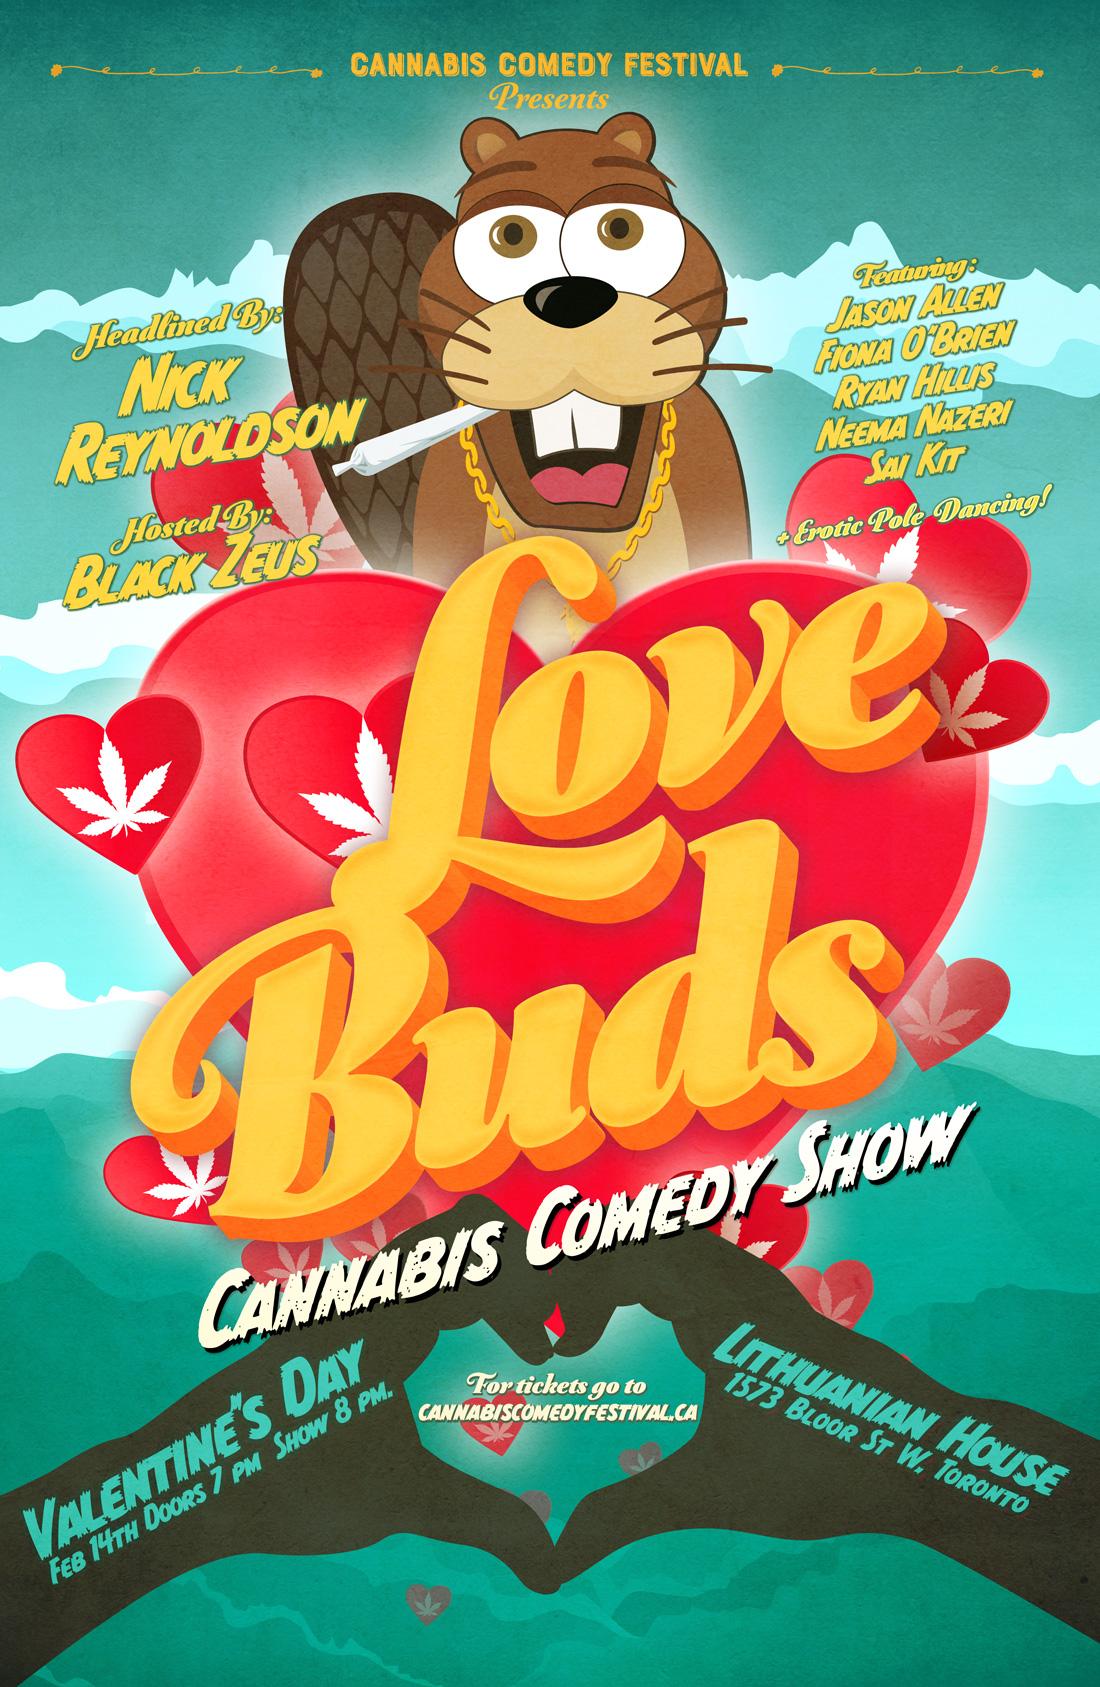 Toronto Valentines Day Cannabis Comedy Show